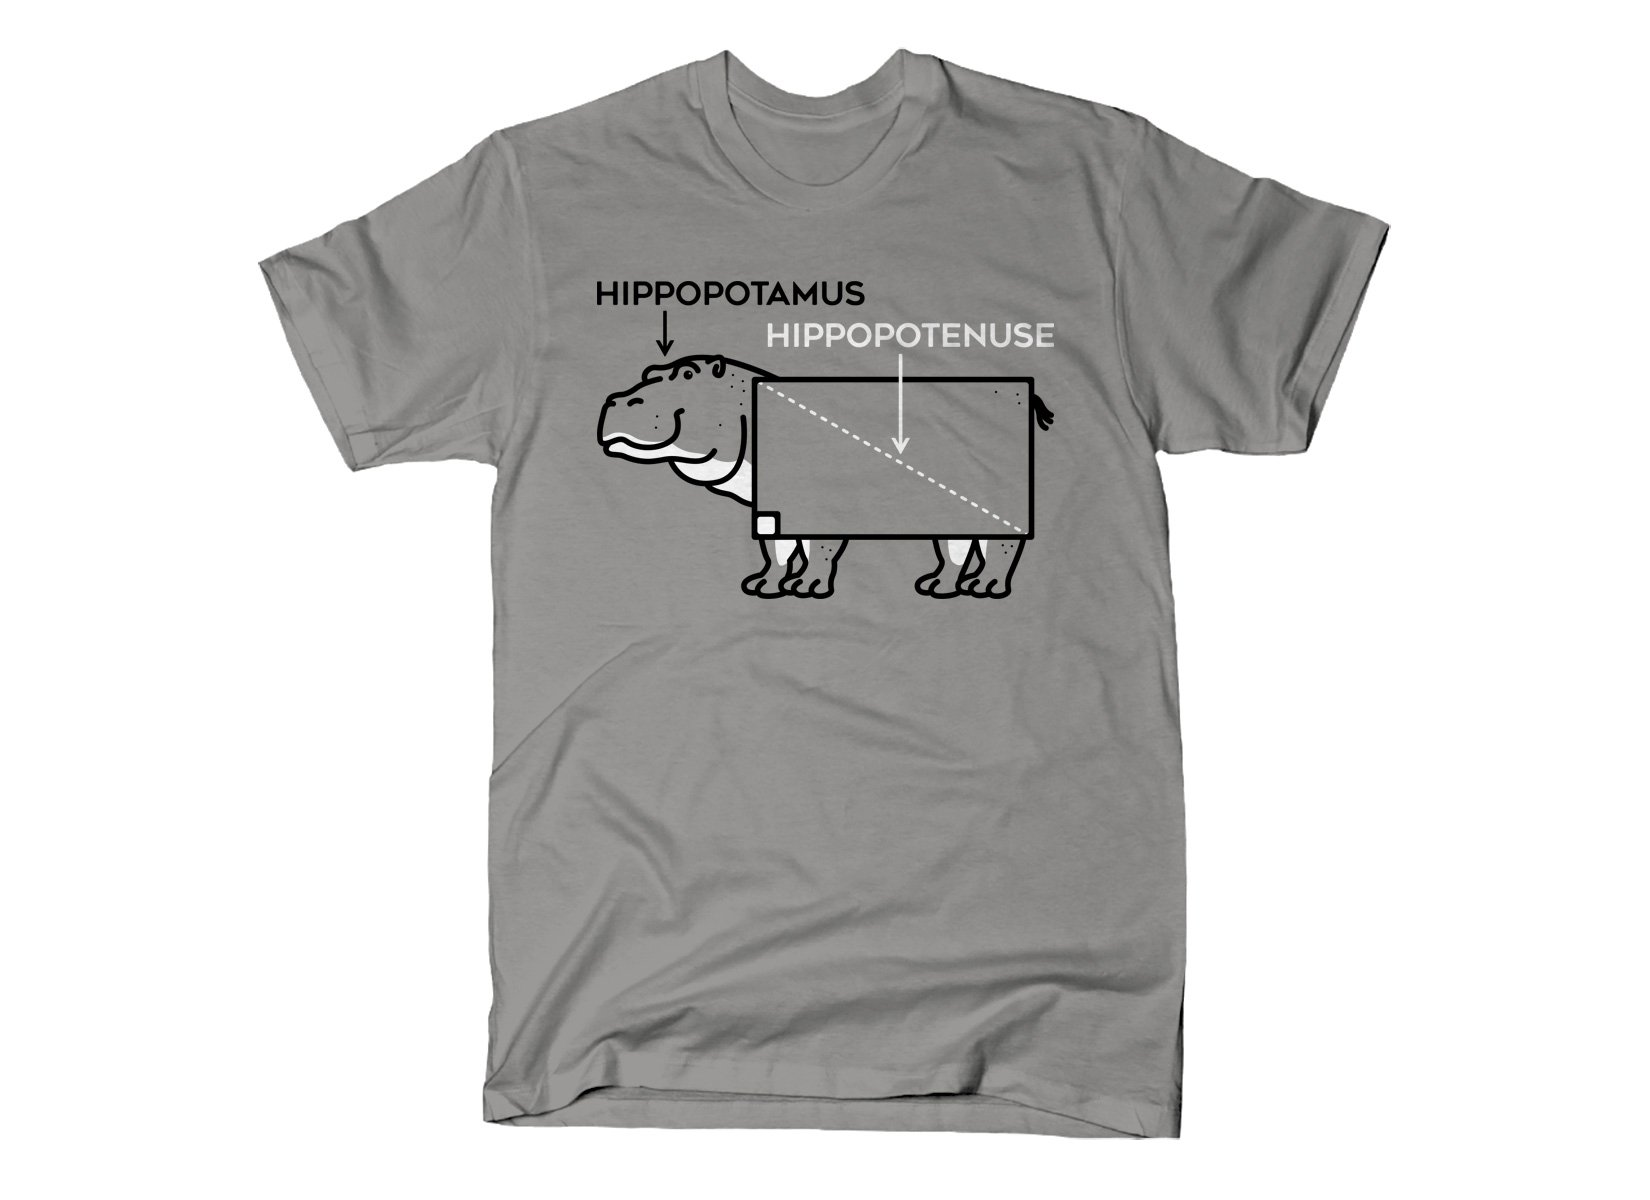 Hippopotenuse on Mens T-Shirt